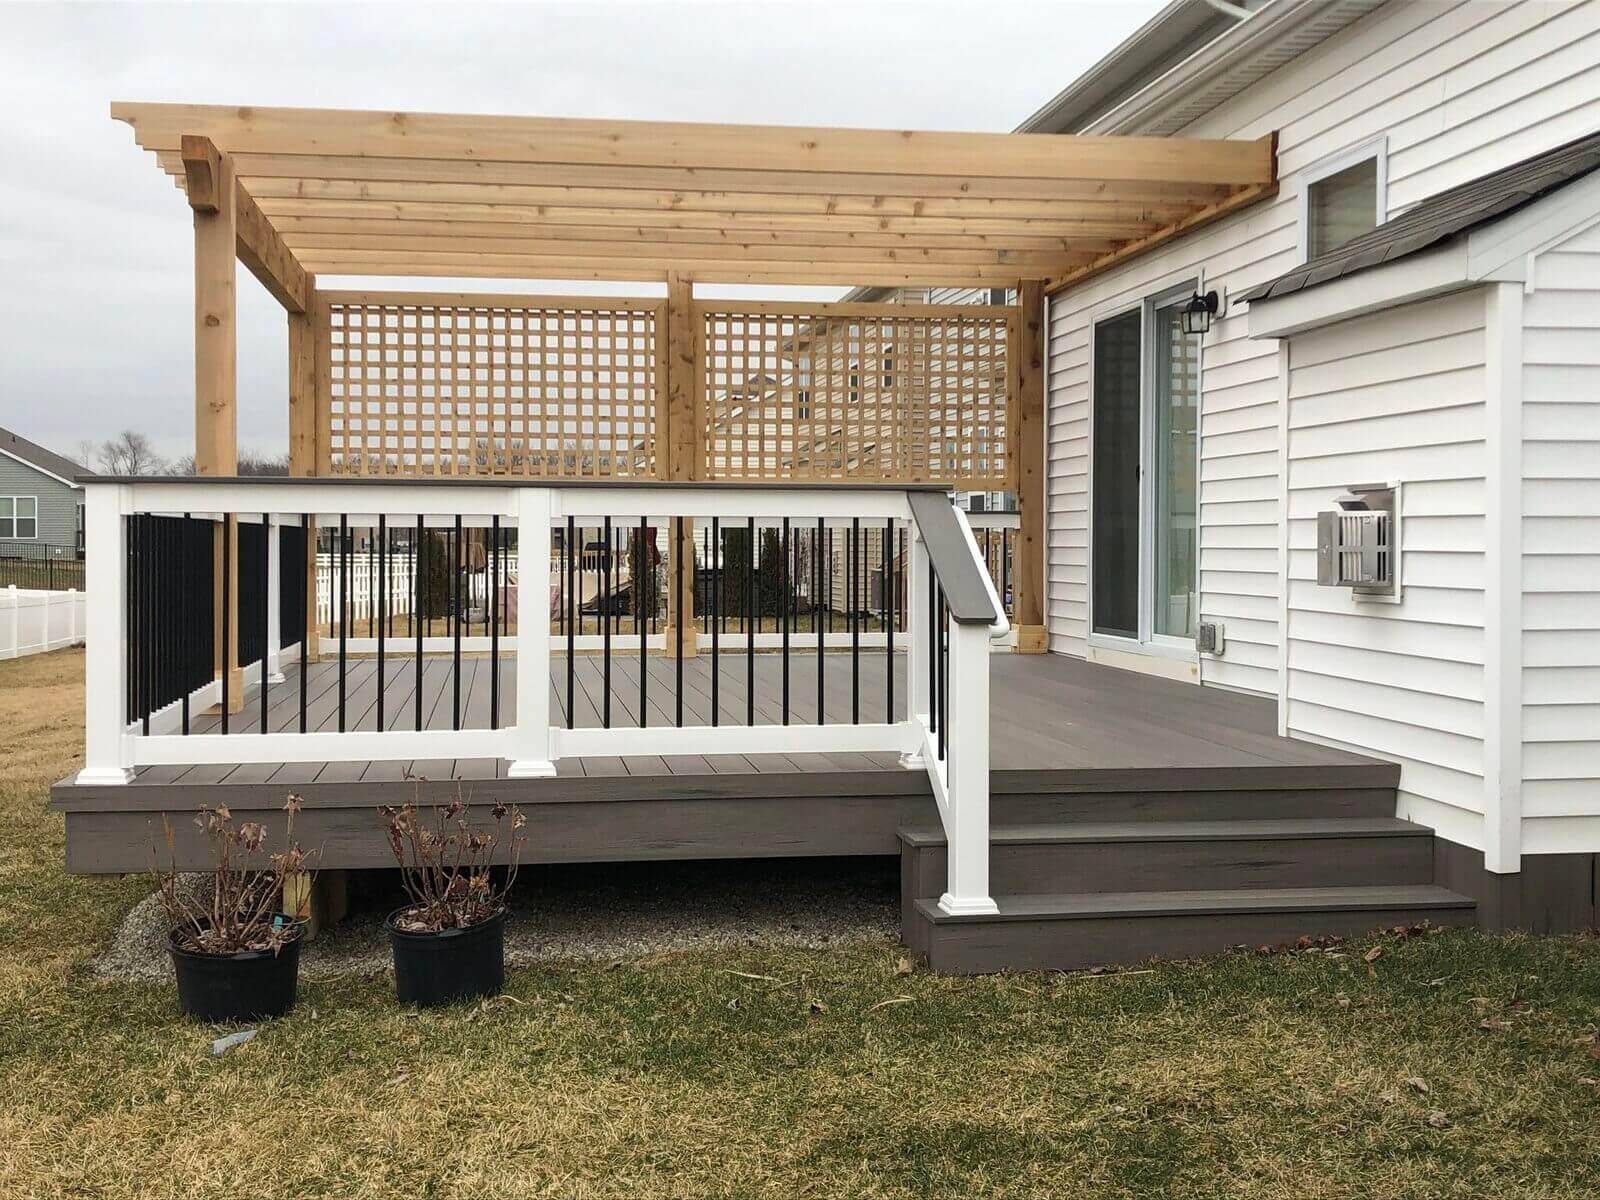 Custom backyard deck with pergola and privacy screen